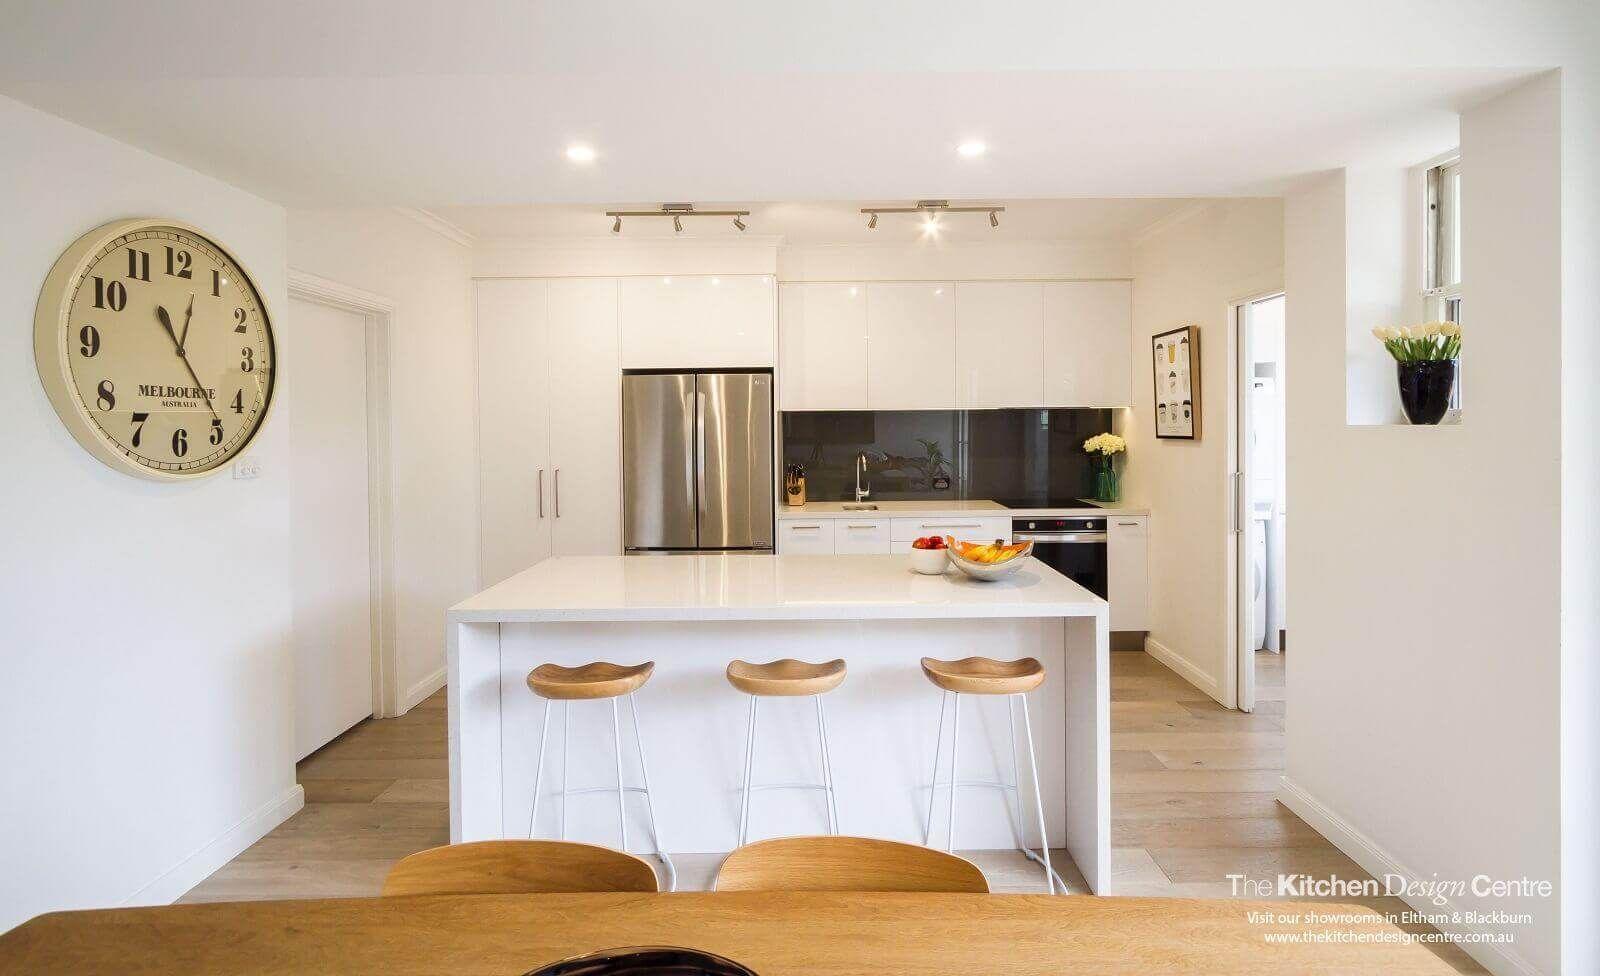 brighton the kitchen design centre kew | Home Design | Pinterest ...